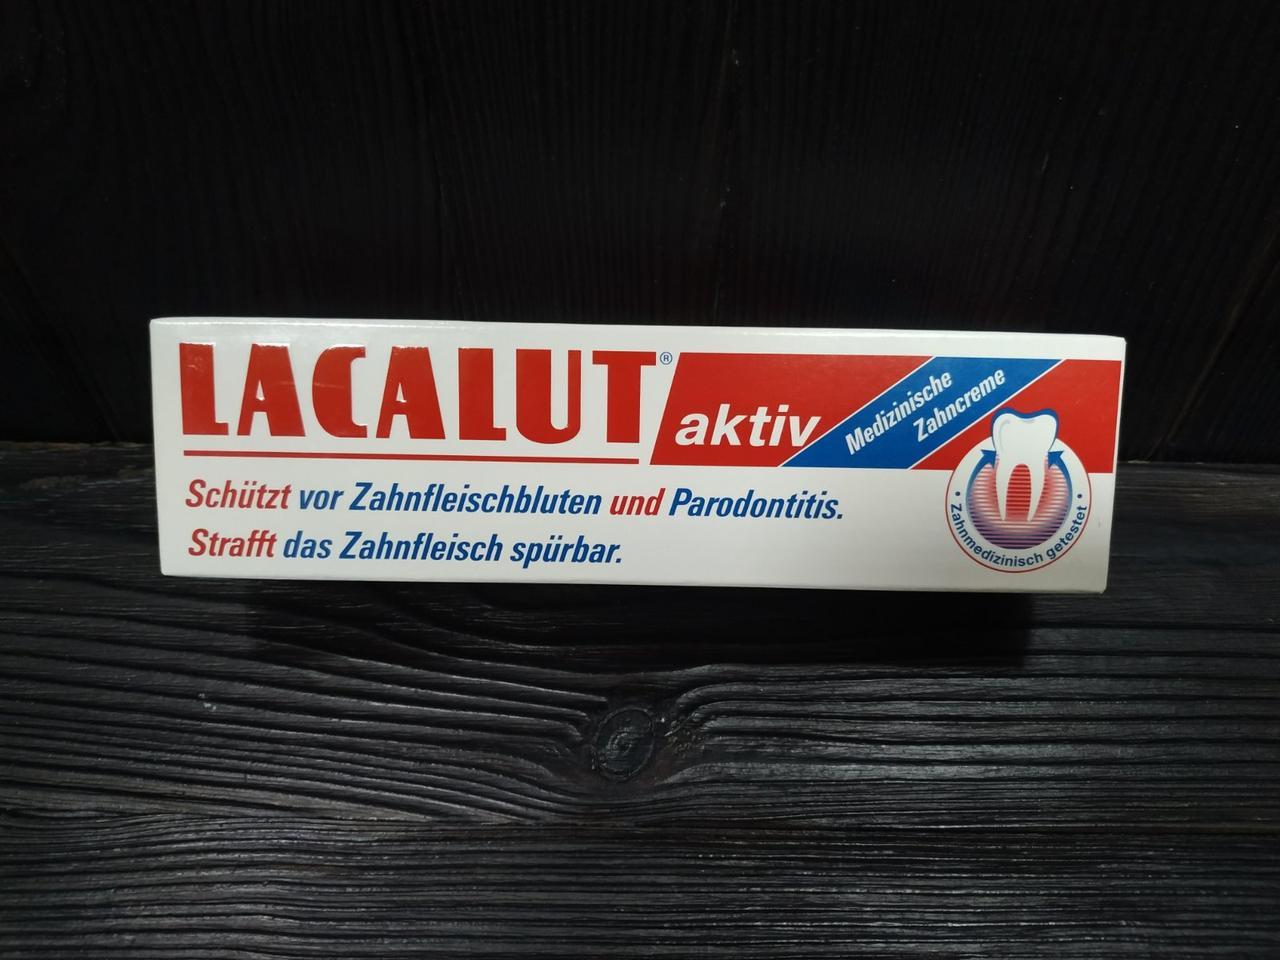 Lacalut Aktive зубная паста 100 ml Германия